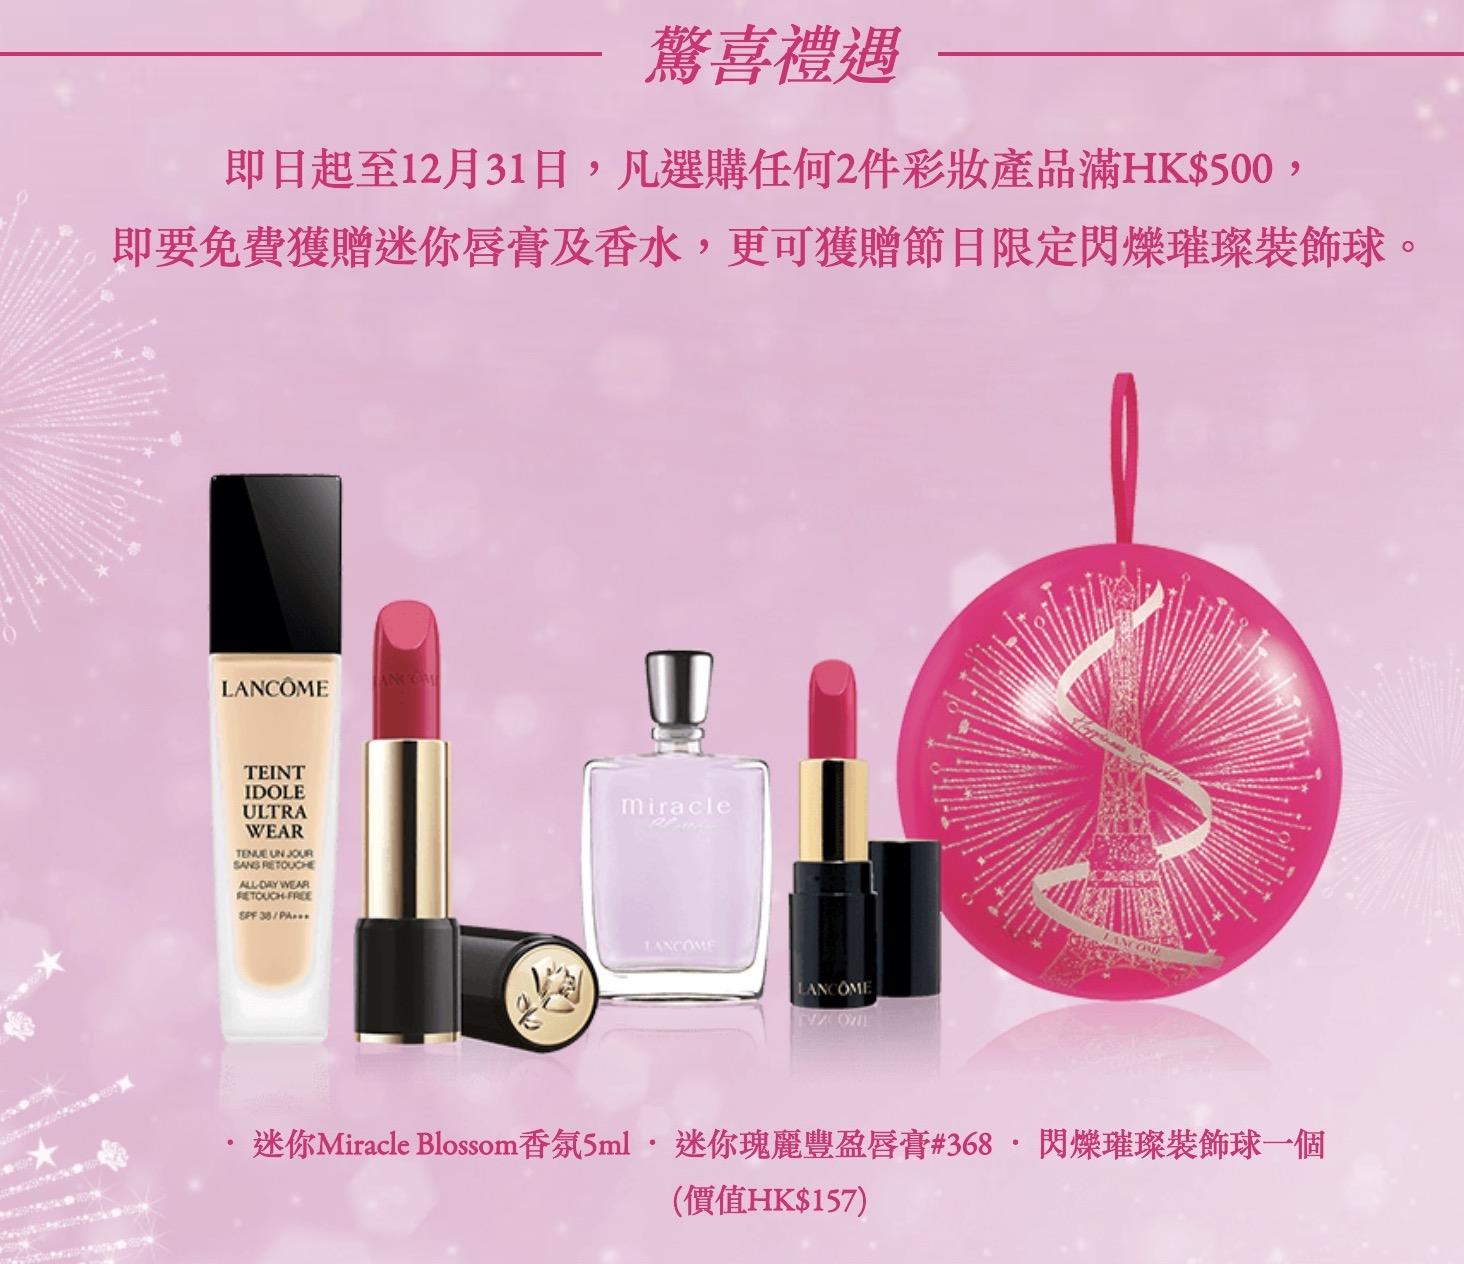 Beautylife HK - 訂製專屬唇膏丨Lancôme「瑰麗唇膏個人化」巡迴